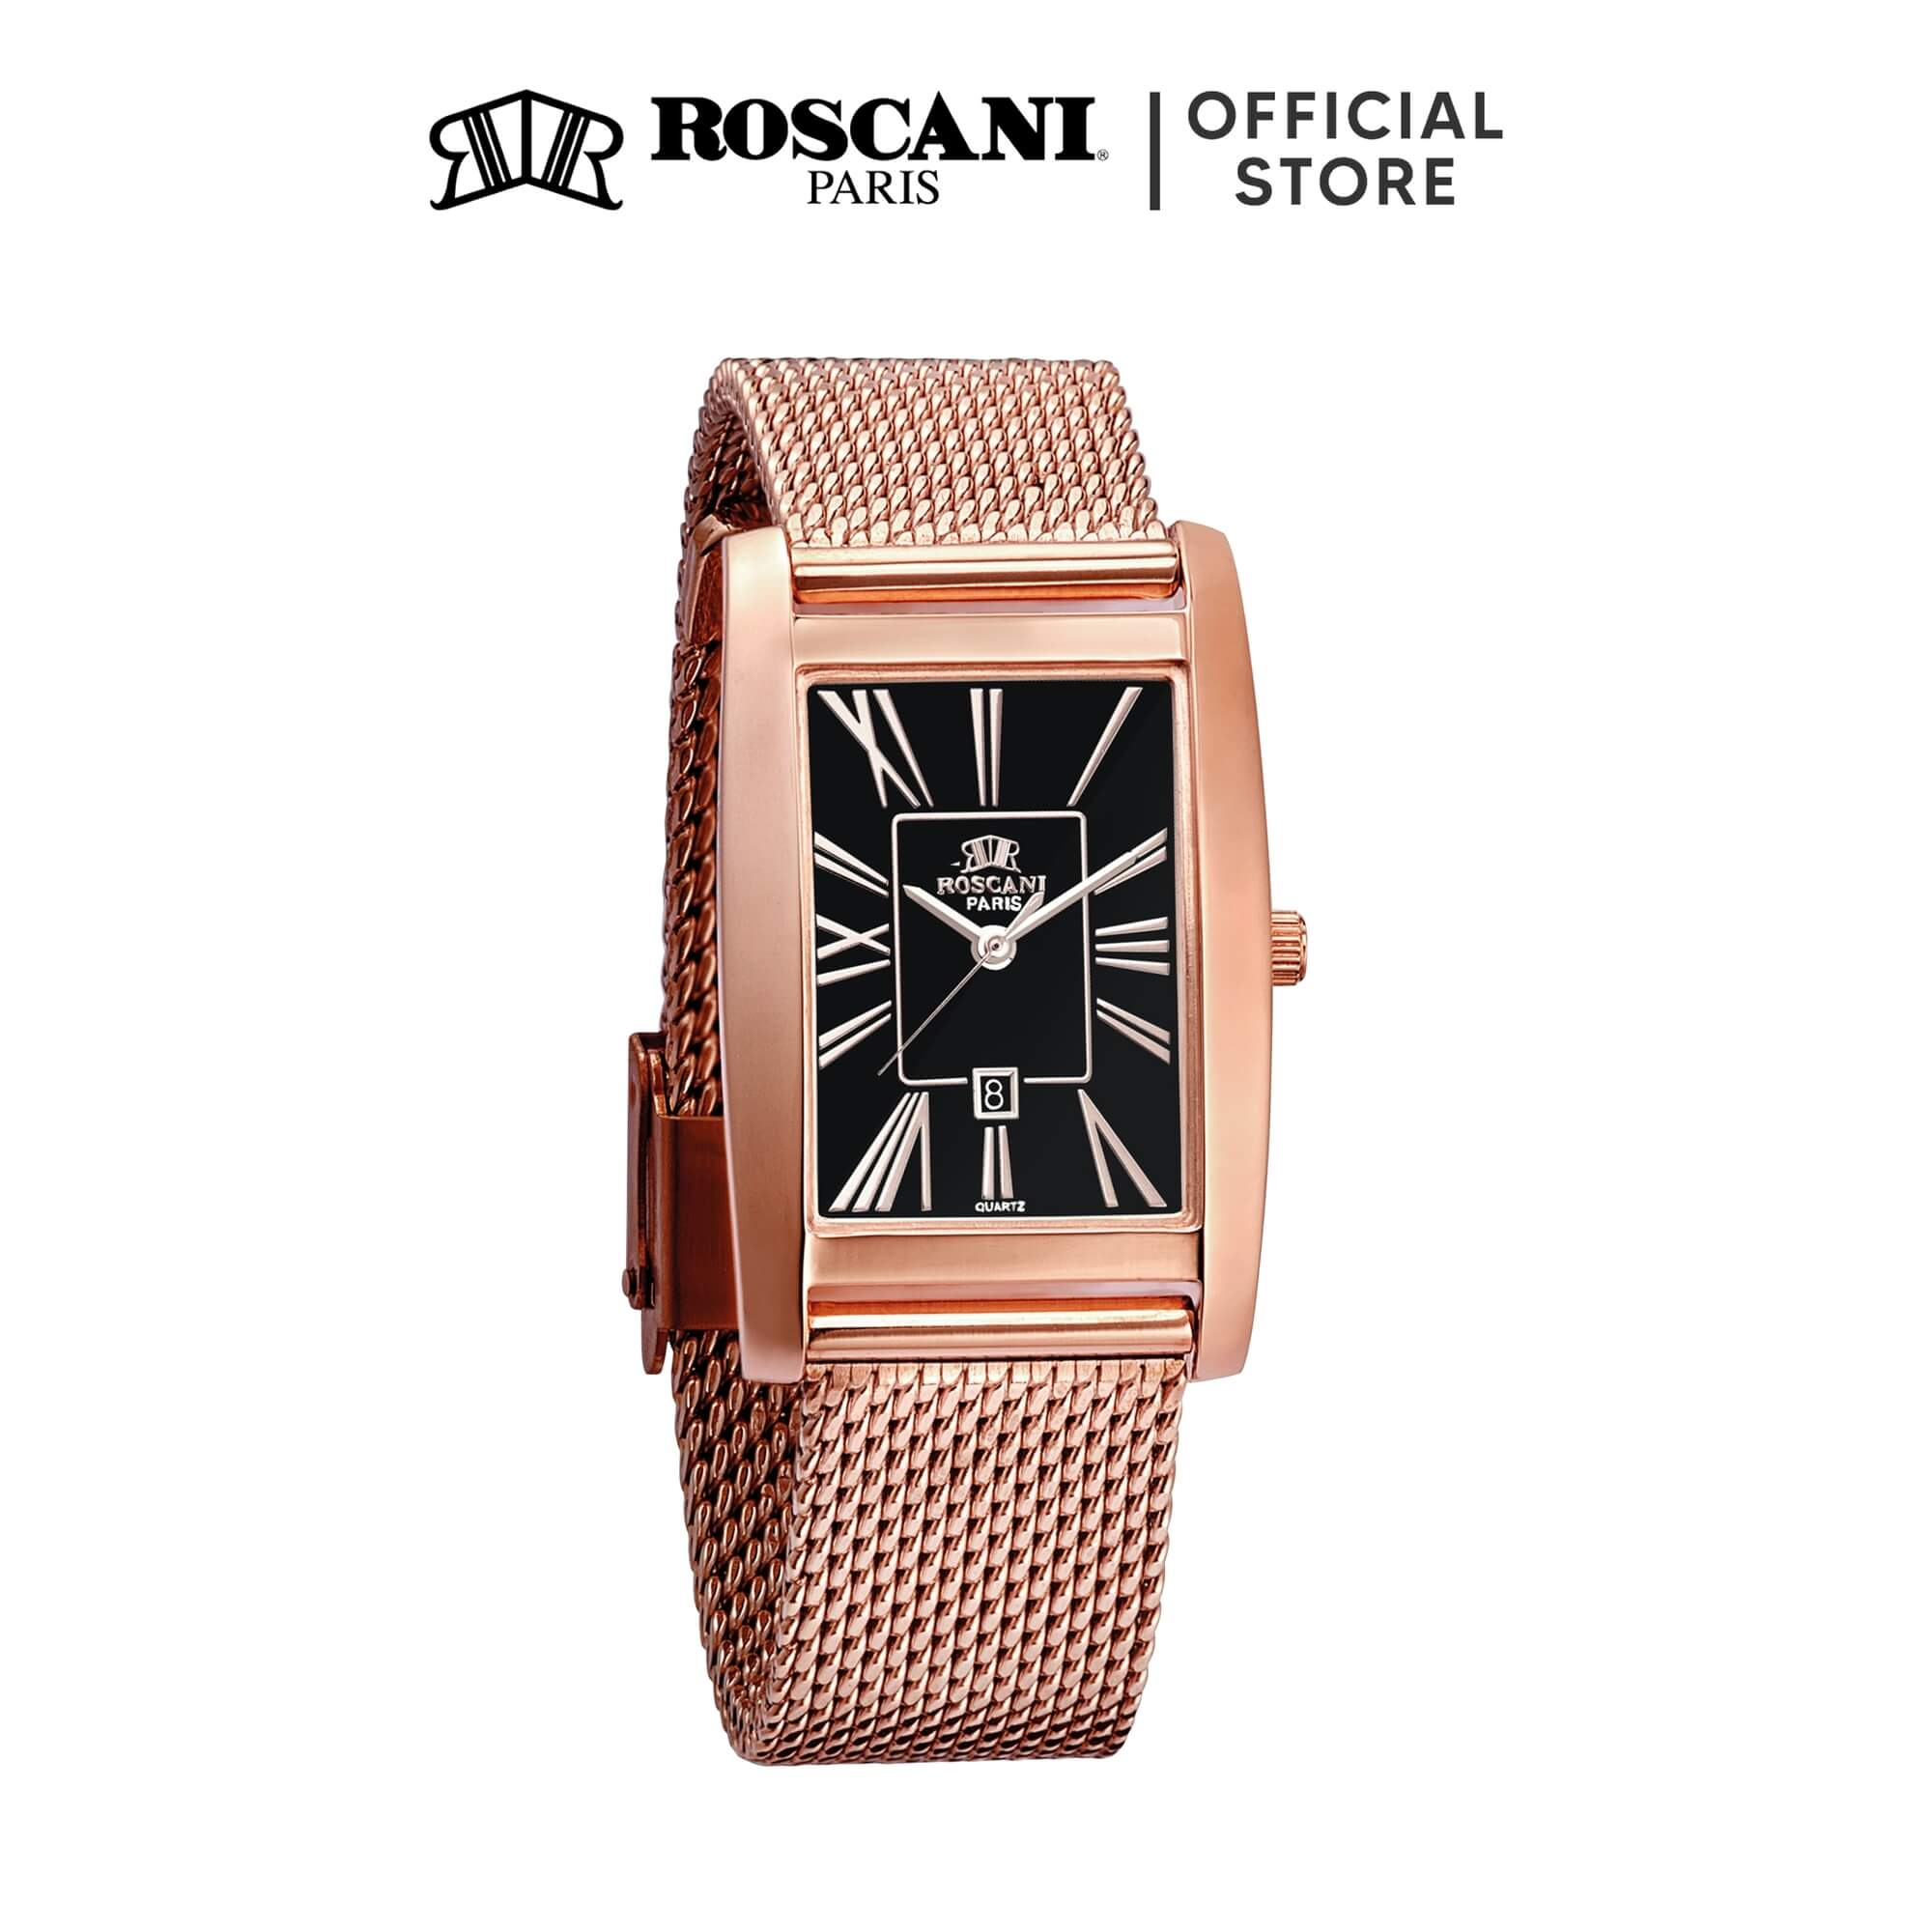 Roscani Riana 406 (Curved Crystal) Mesh Women Watch